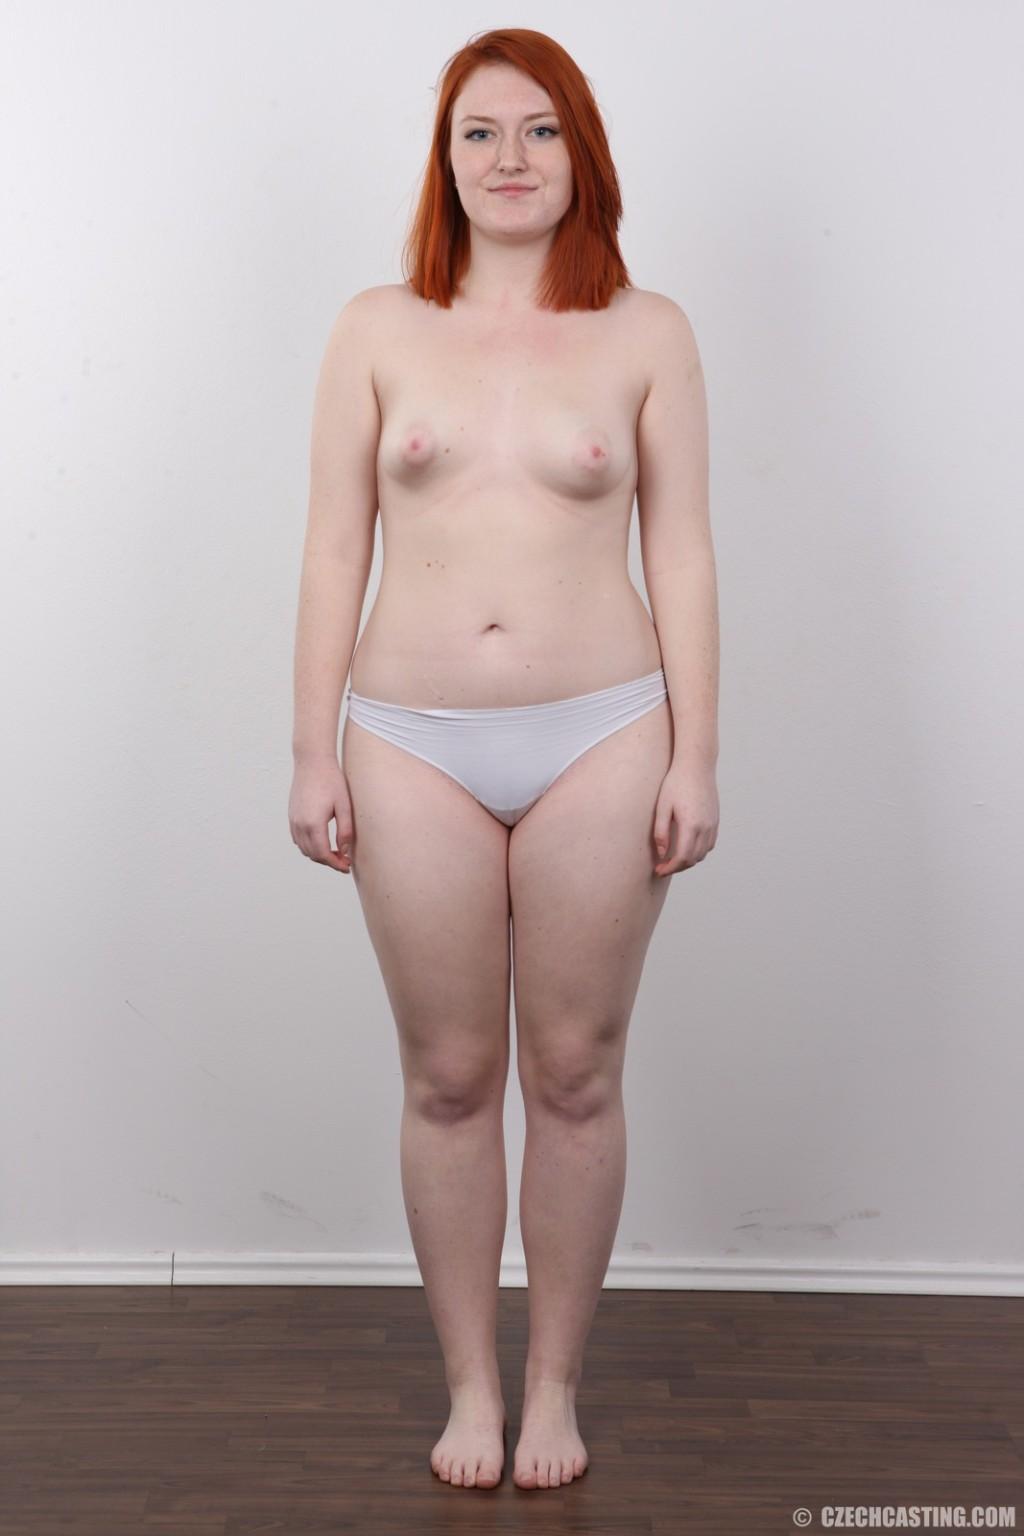 Not zebra girls nude